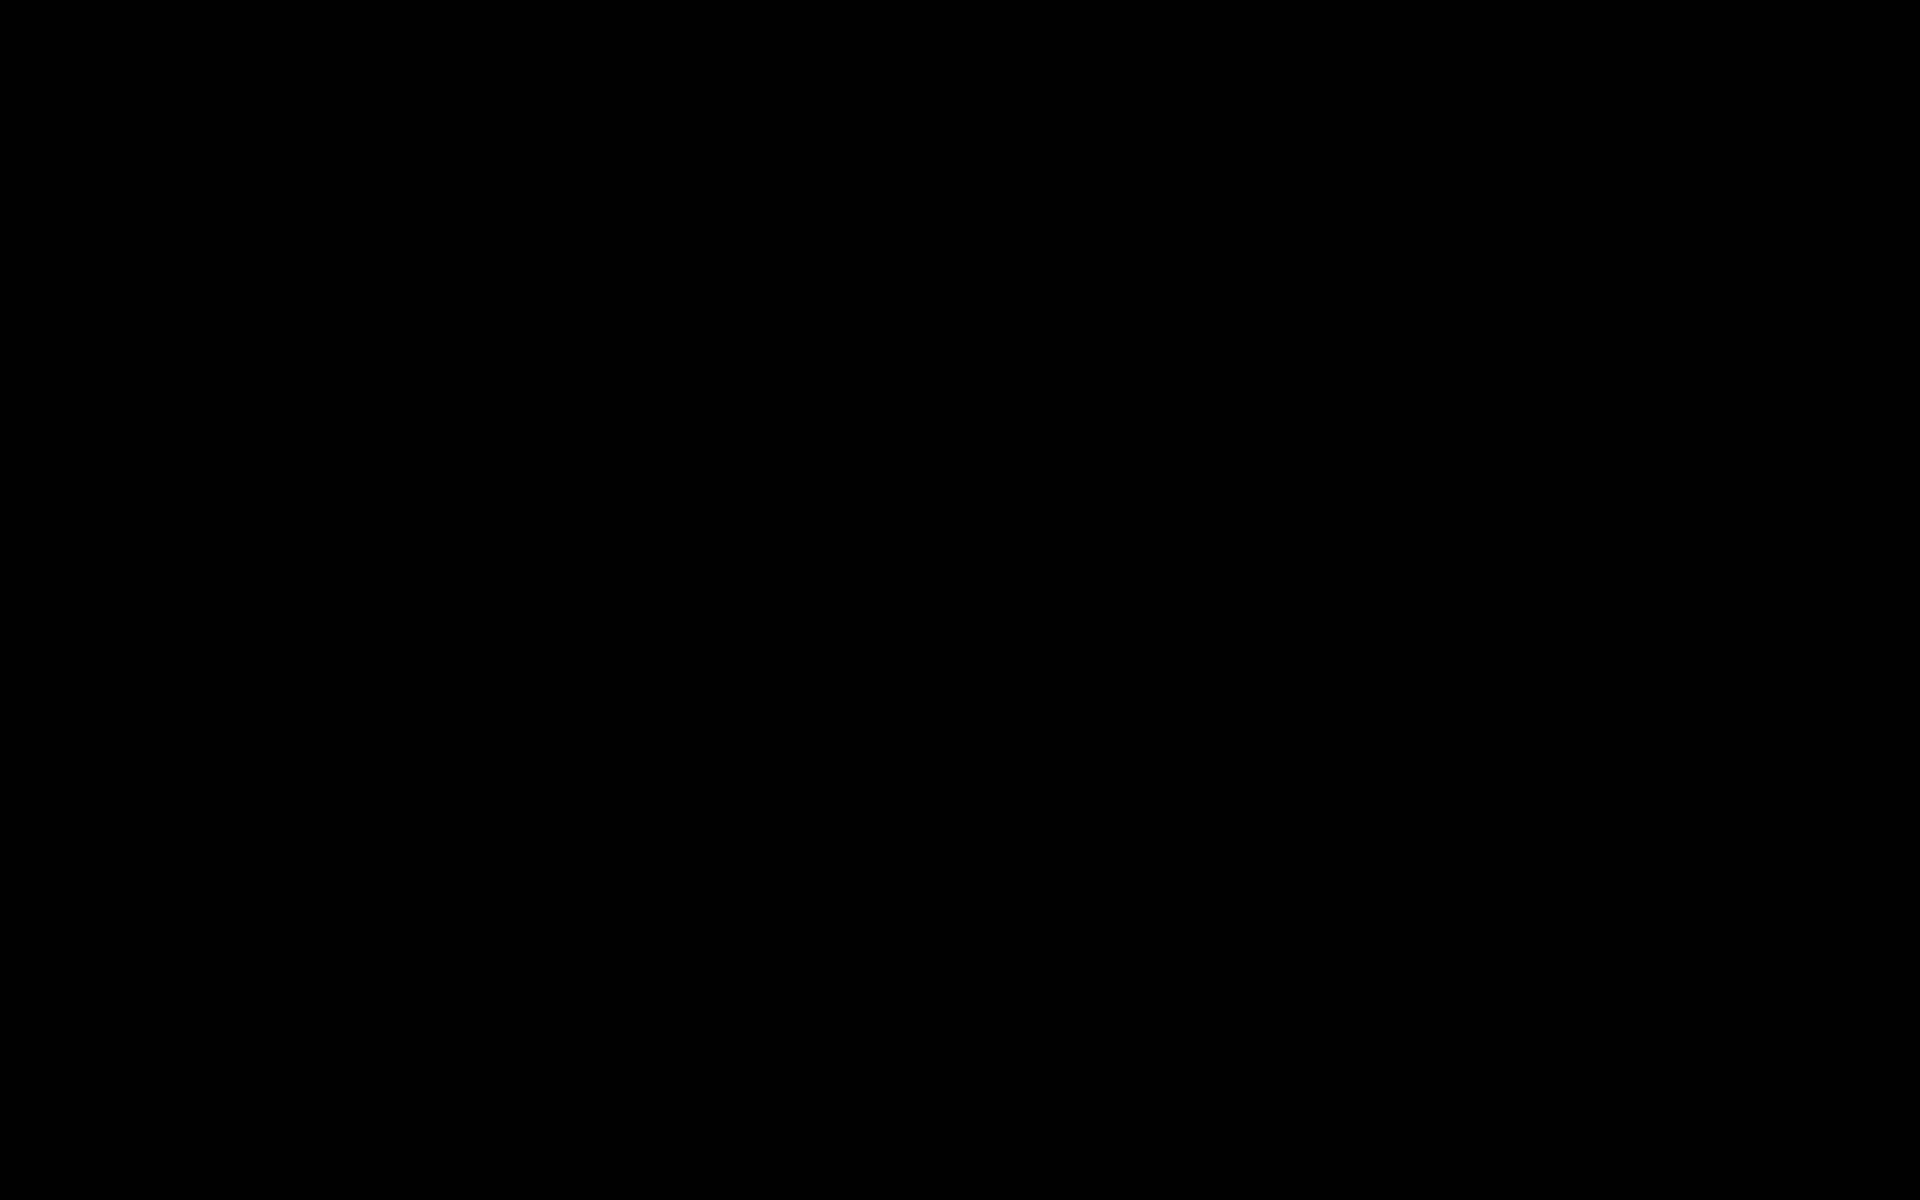 074-13112015